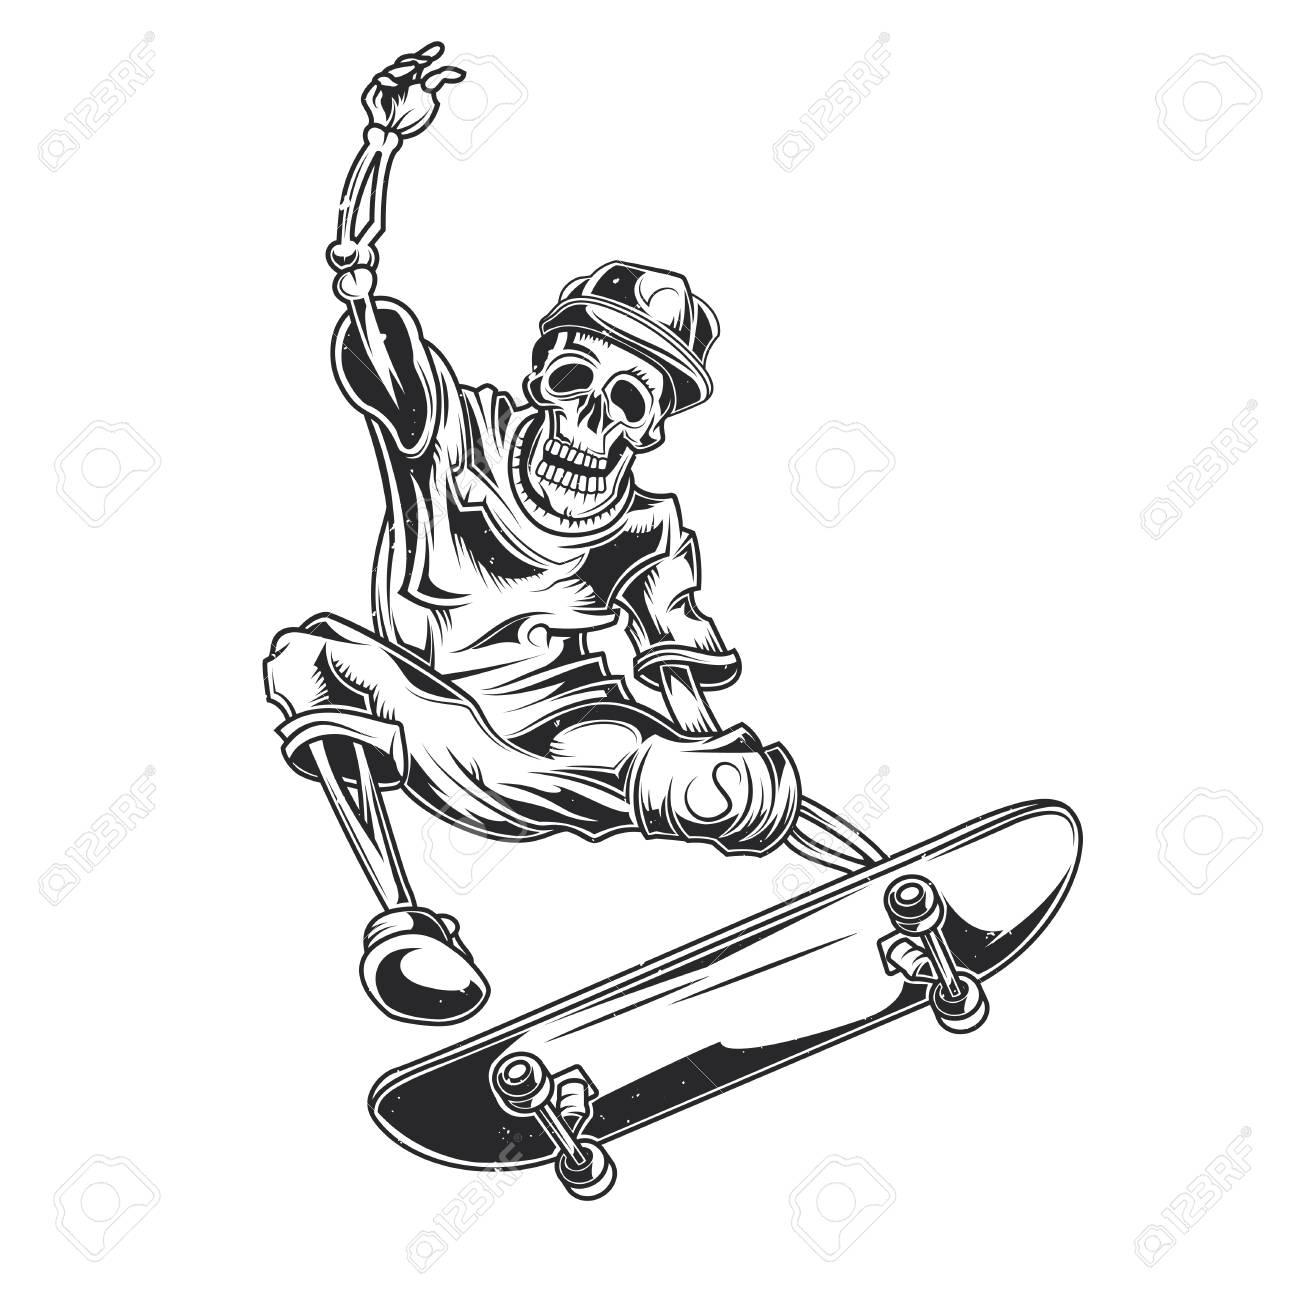 Vector illustration of skeleton on skate board. - 96283389